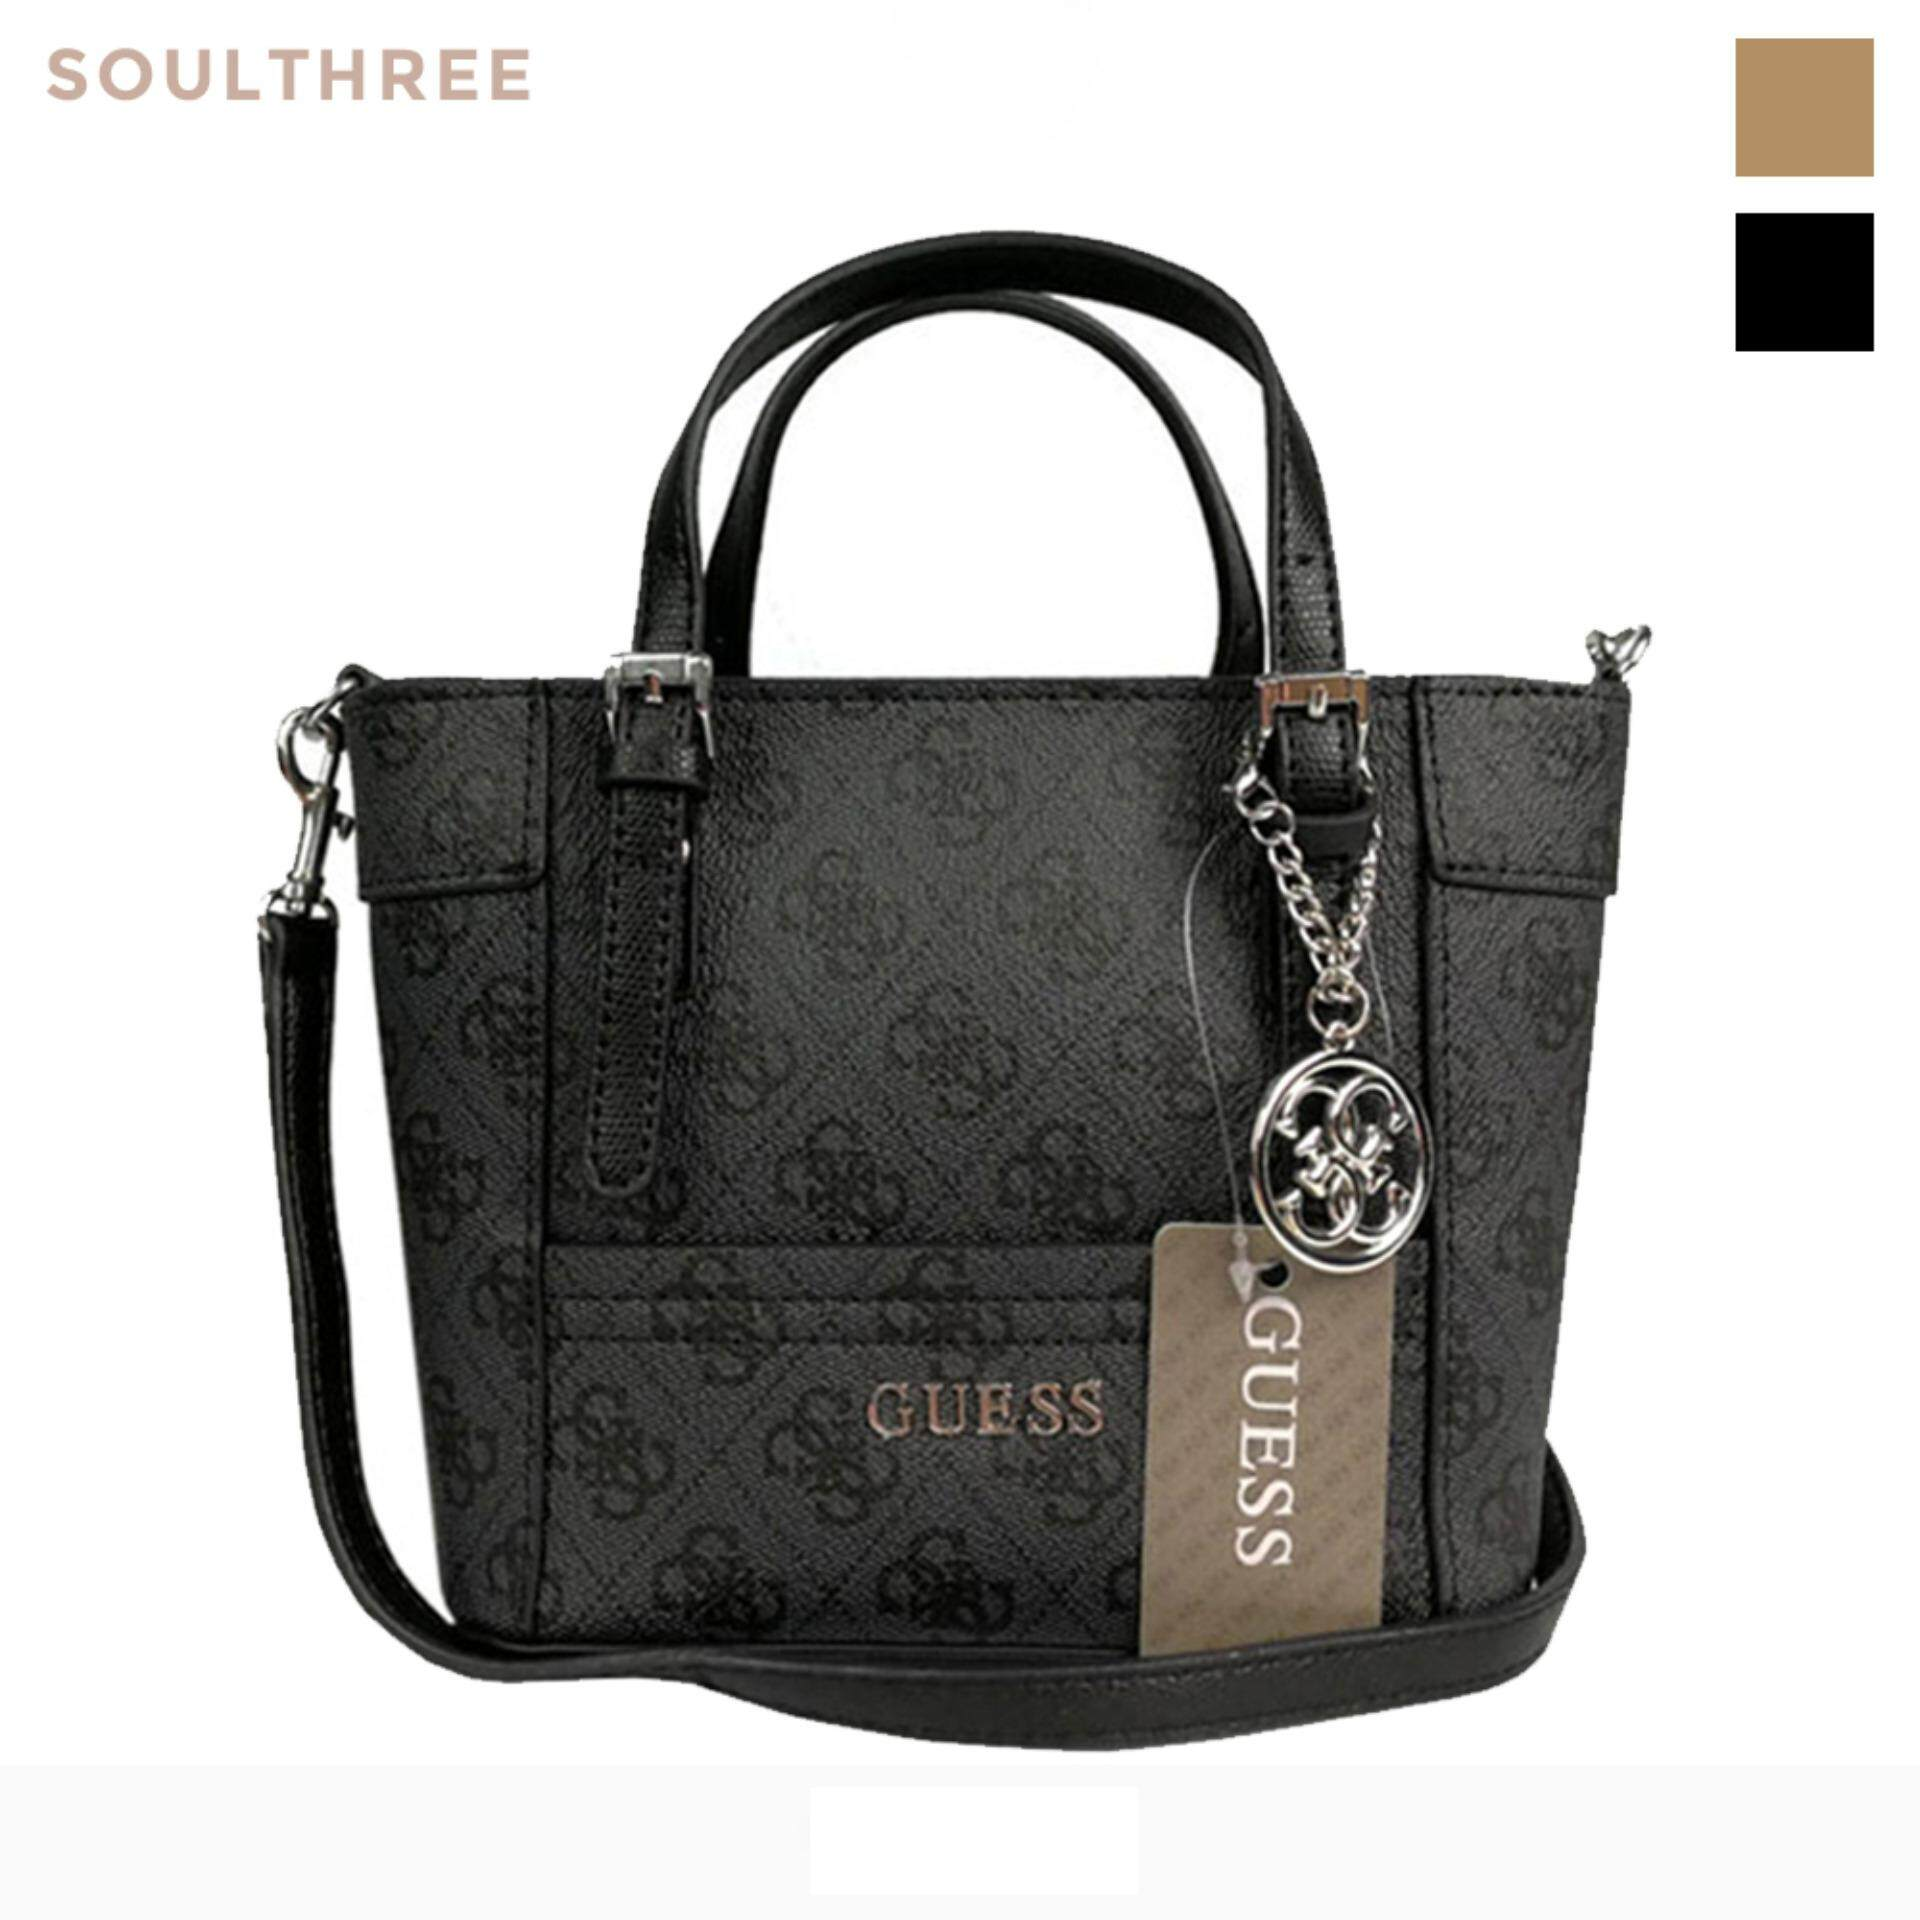 Guess Imported Delaney Signature Logo Pattern Pee Mini Crossbody Handbag Messenger Sling Shoulder Bag